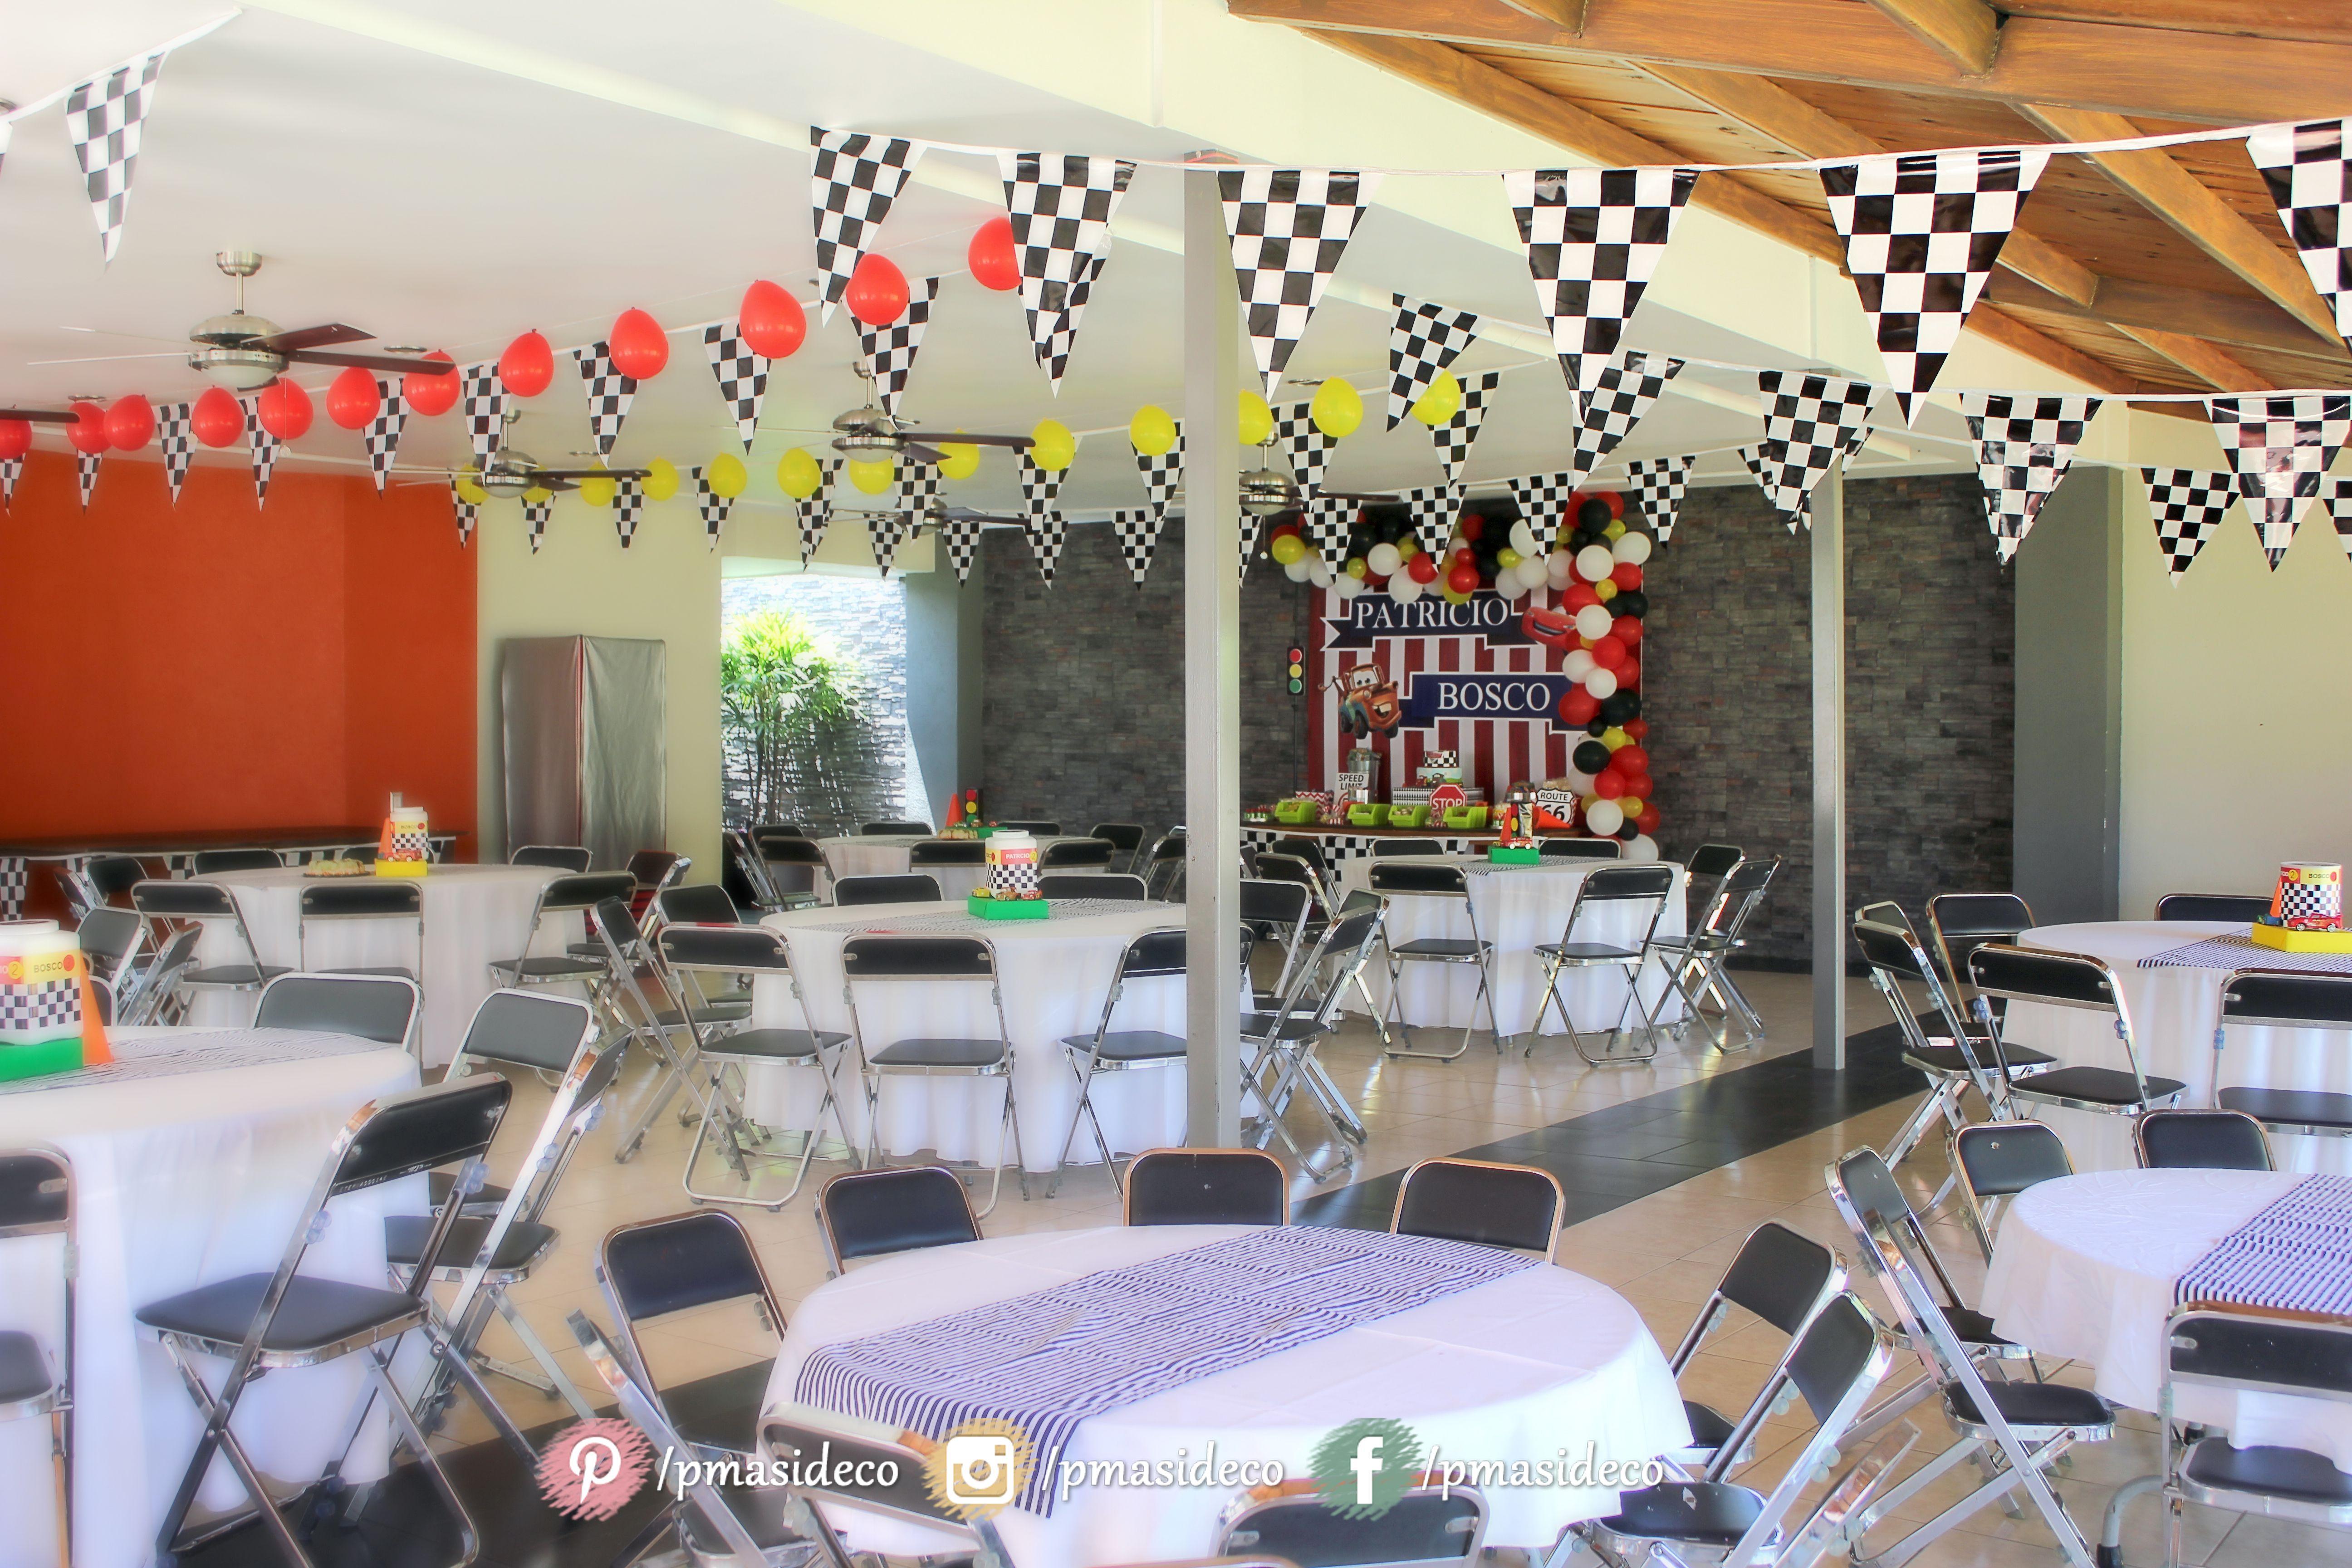 P i deco eventos con detalle fiestas infantiles for Todo decoracion